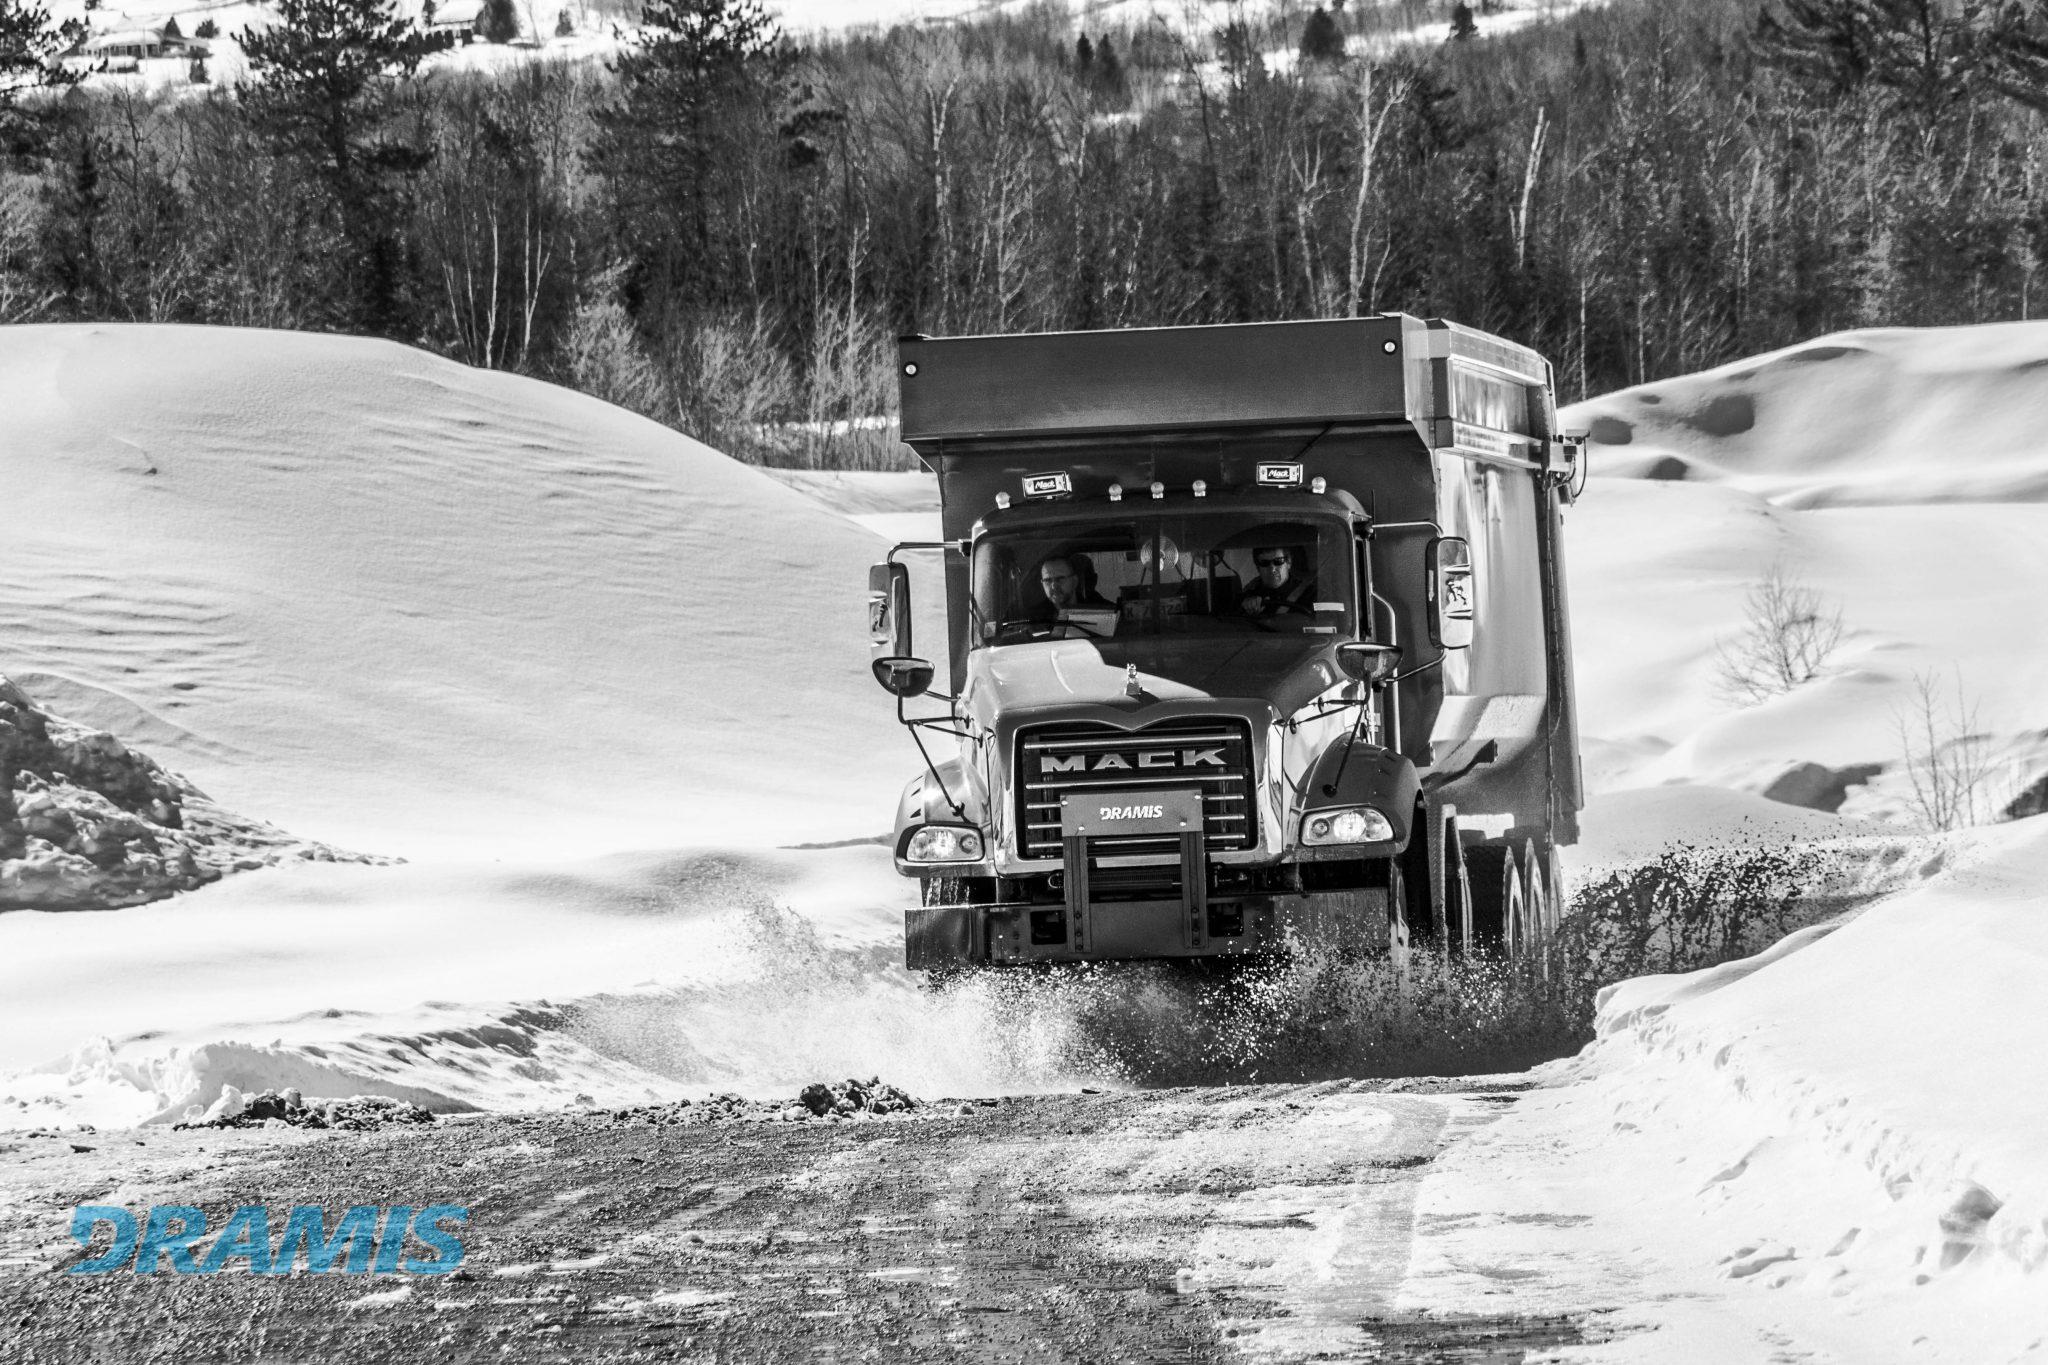 Dramis D55T Mack Granite dump Truck Excon Construccion